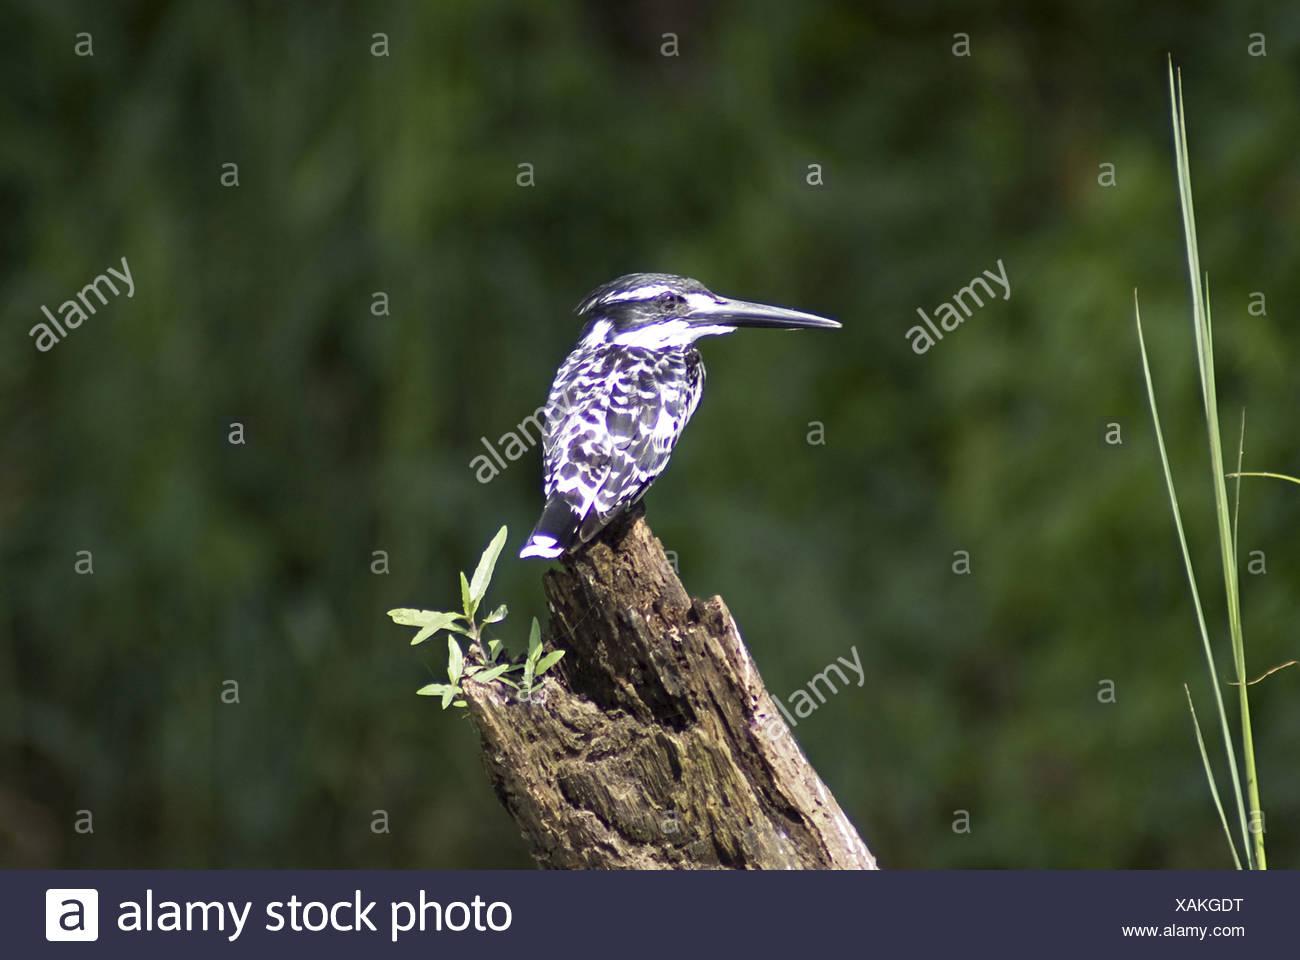 Pied Kingfisher (Ceryle rudis) is a kingfisher in the near passerine bird family Cerylidae, Ranganathittu Bird Sanctuary, Mysore - Stock Image